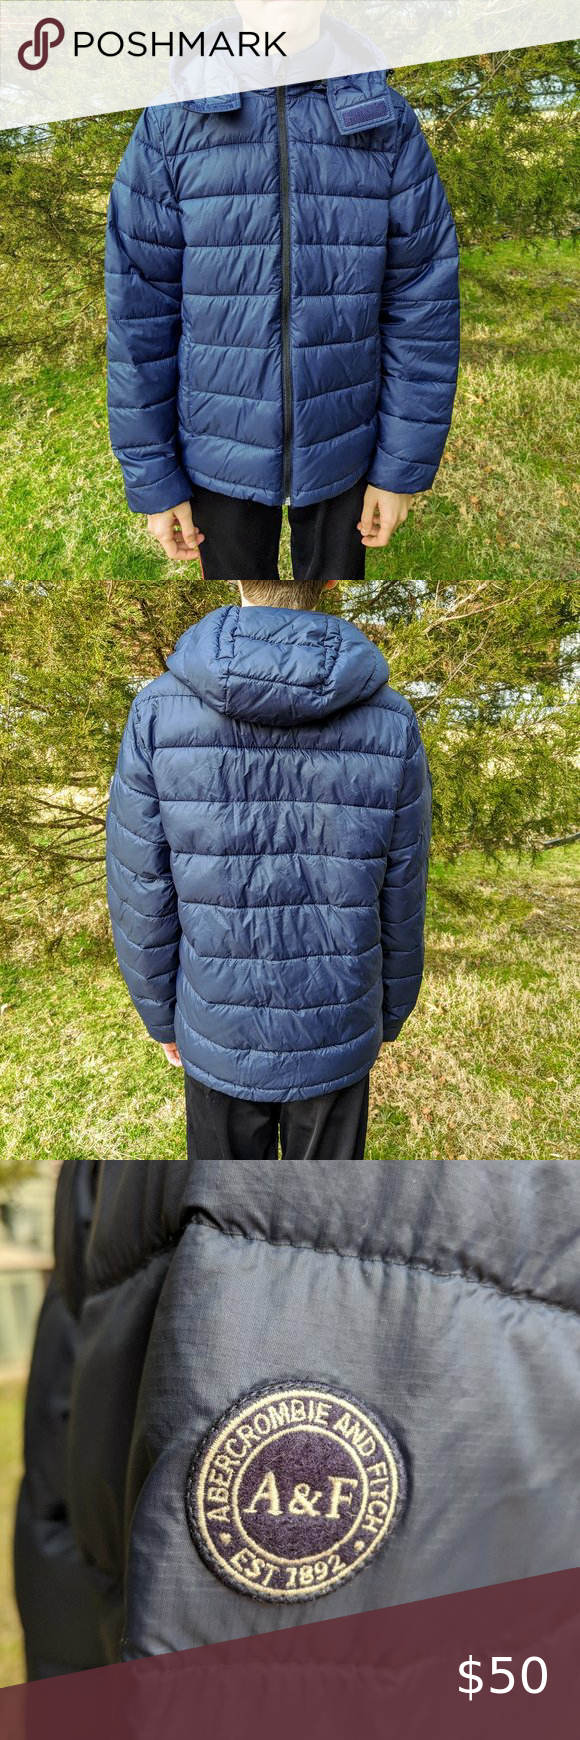 Men S Abercrombie Fitch Navy Puffer Jacket Abercrombie And Fitch Jackets Jackets Puffer Jackets [ 1740 x 580 Pixel ]